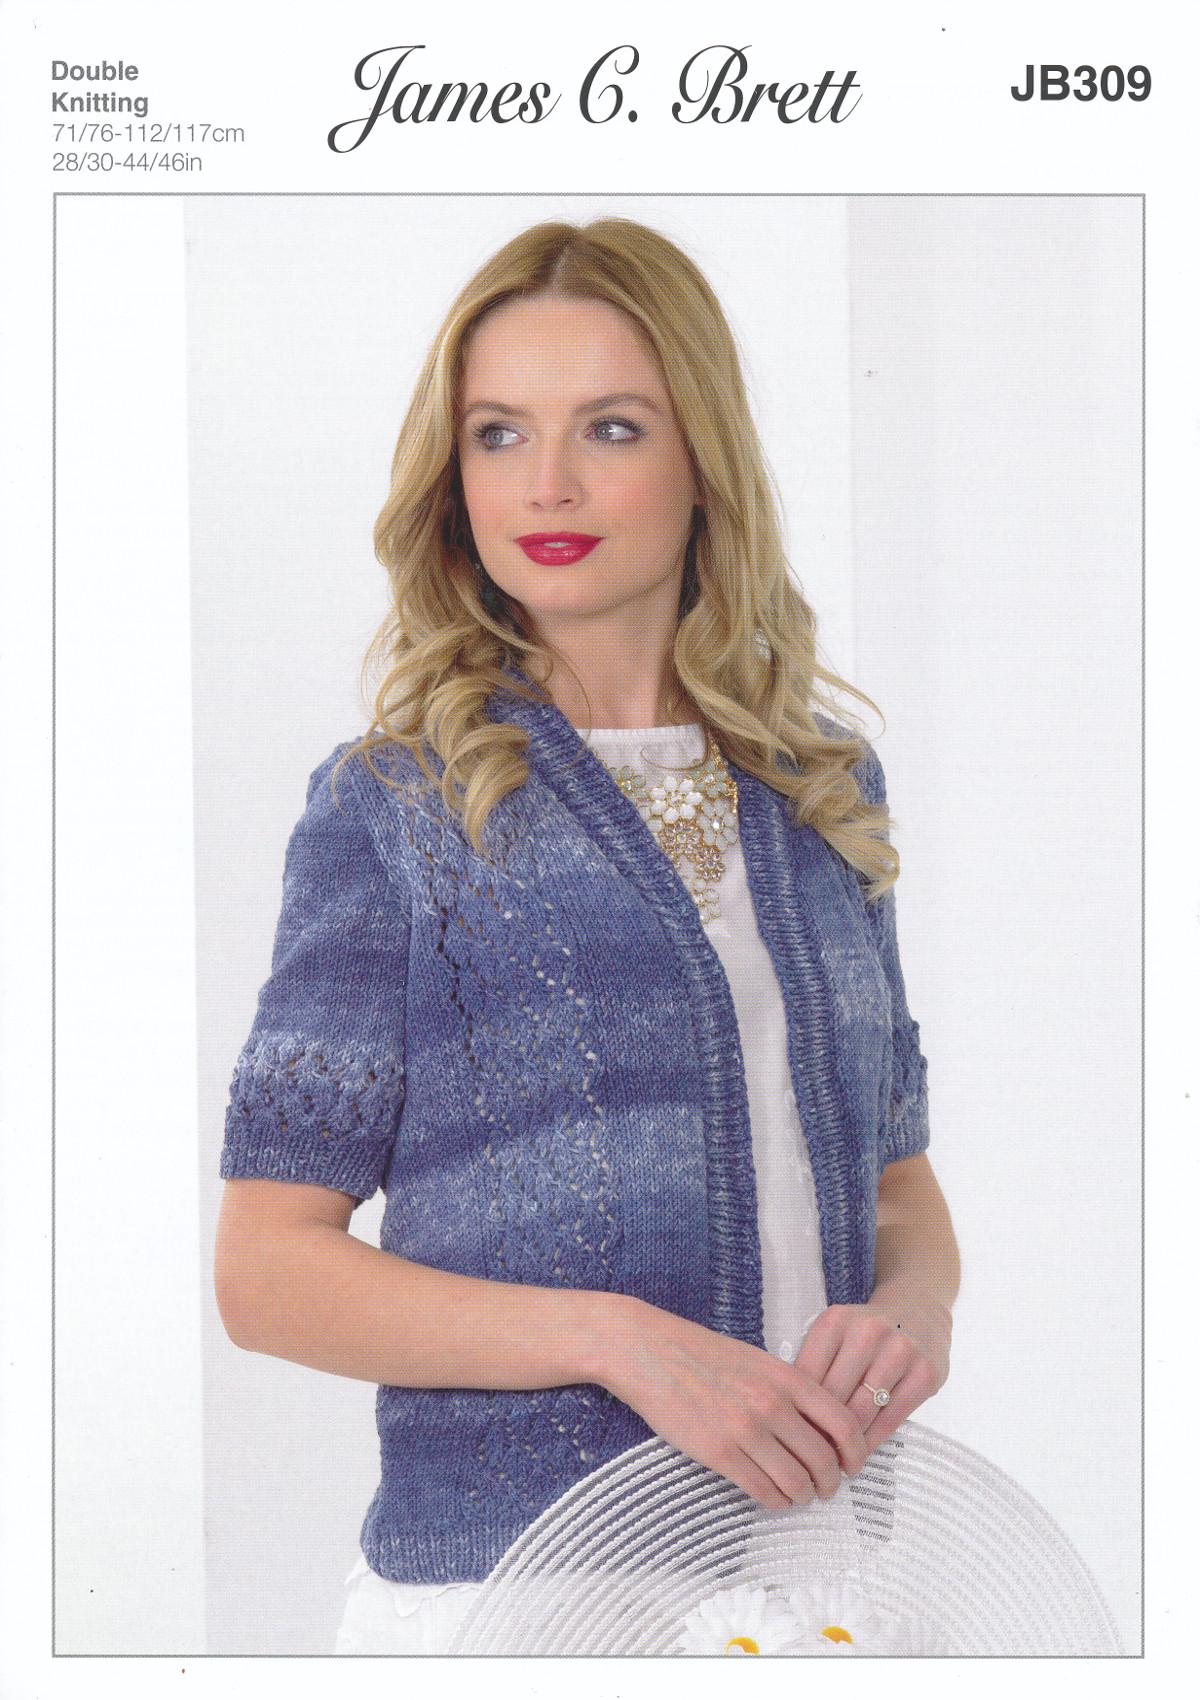 Double Knitting Ladies Jacket Pattern : James Brett Double Knitting Pattern Womens Lace Jacket ...